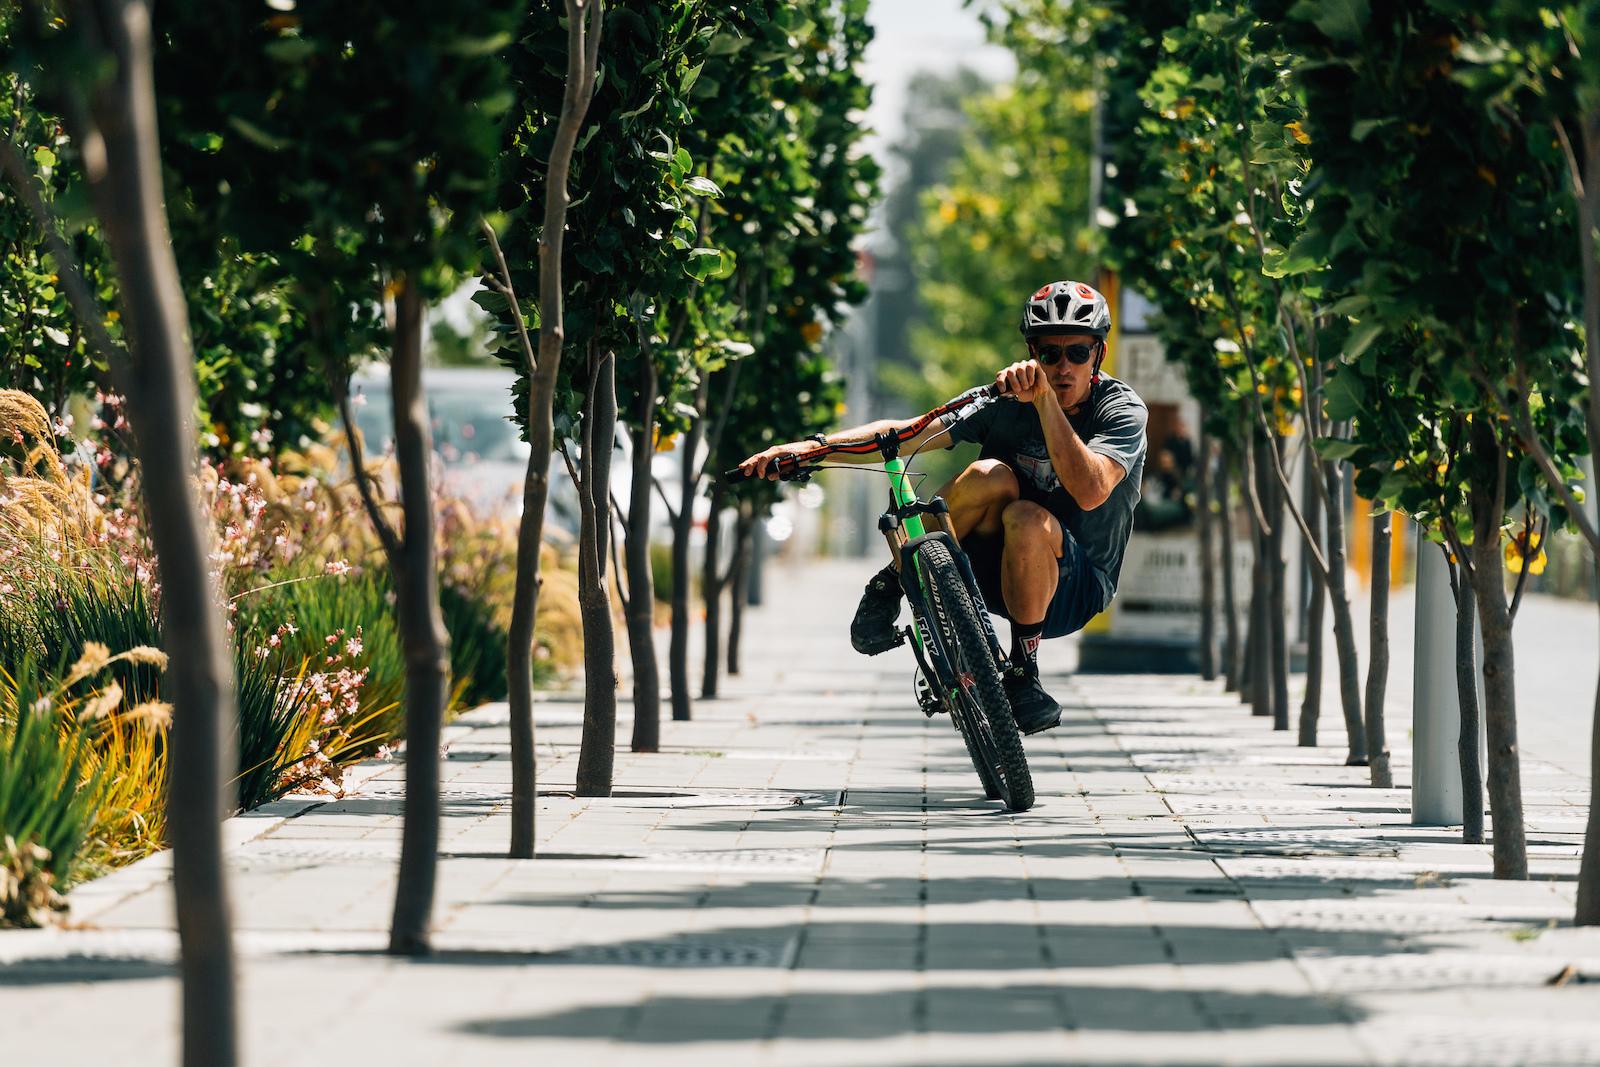 Sam Blenkinsop Lowrider - through the trees.